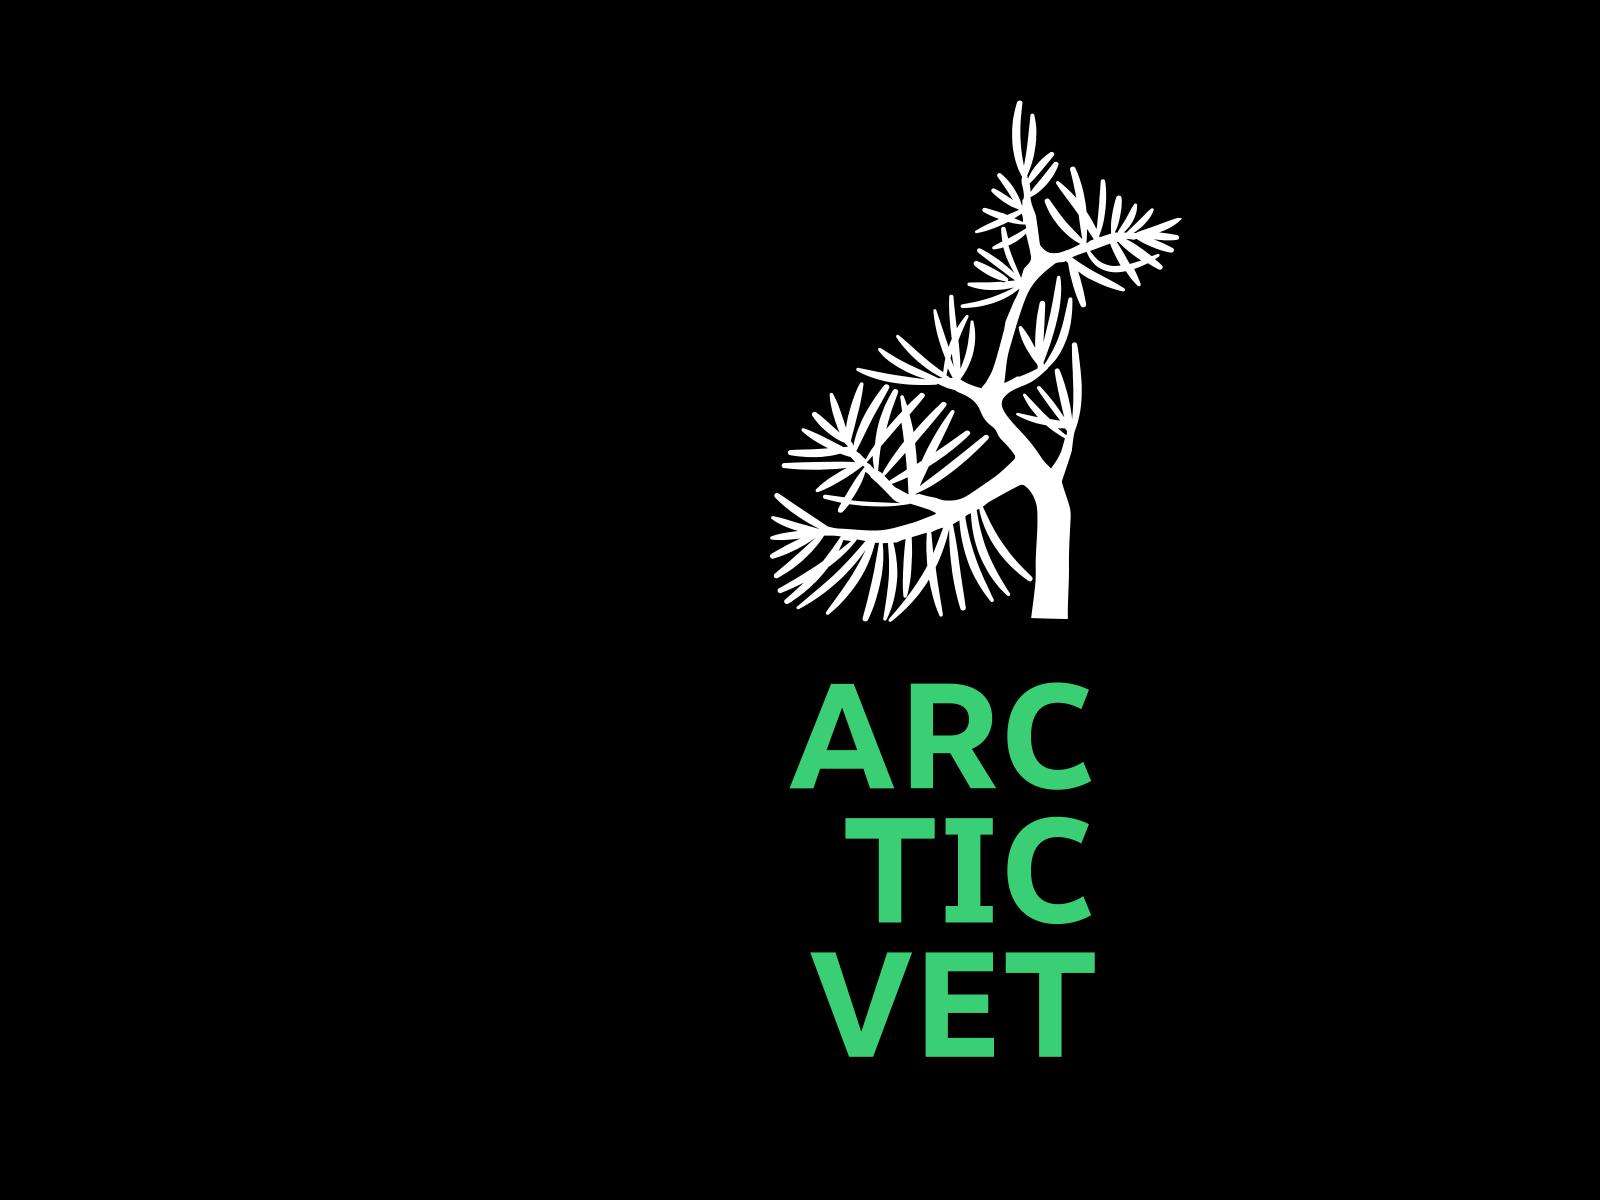 arcticvet-trademark-paws-2019-07-25